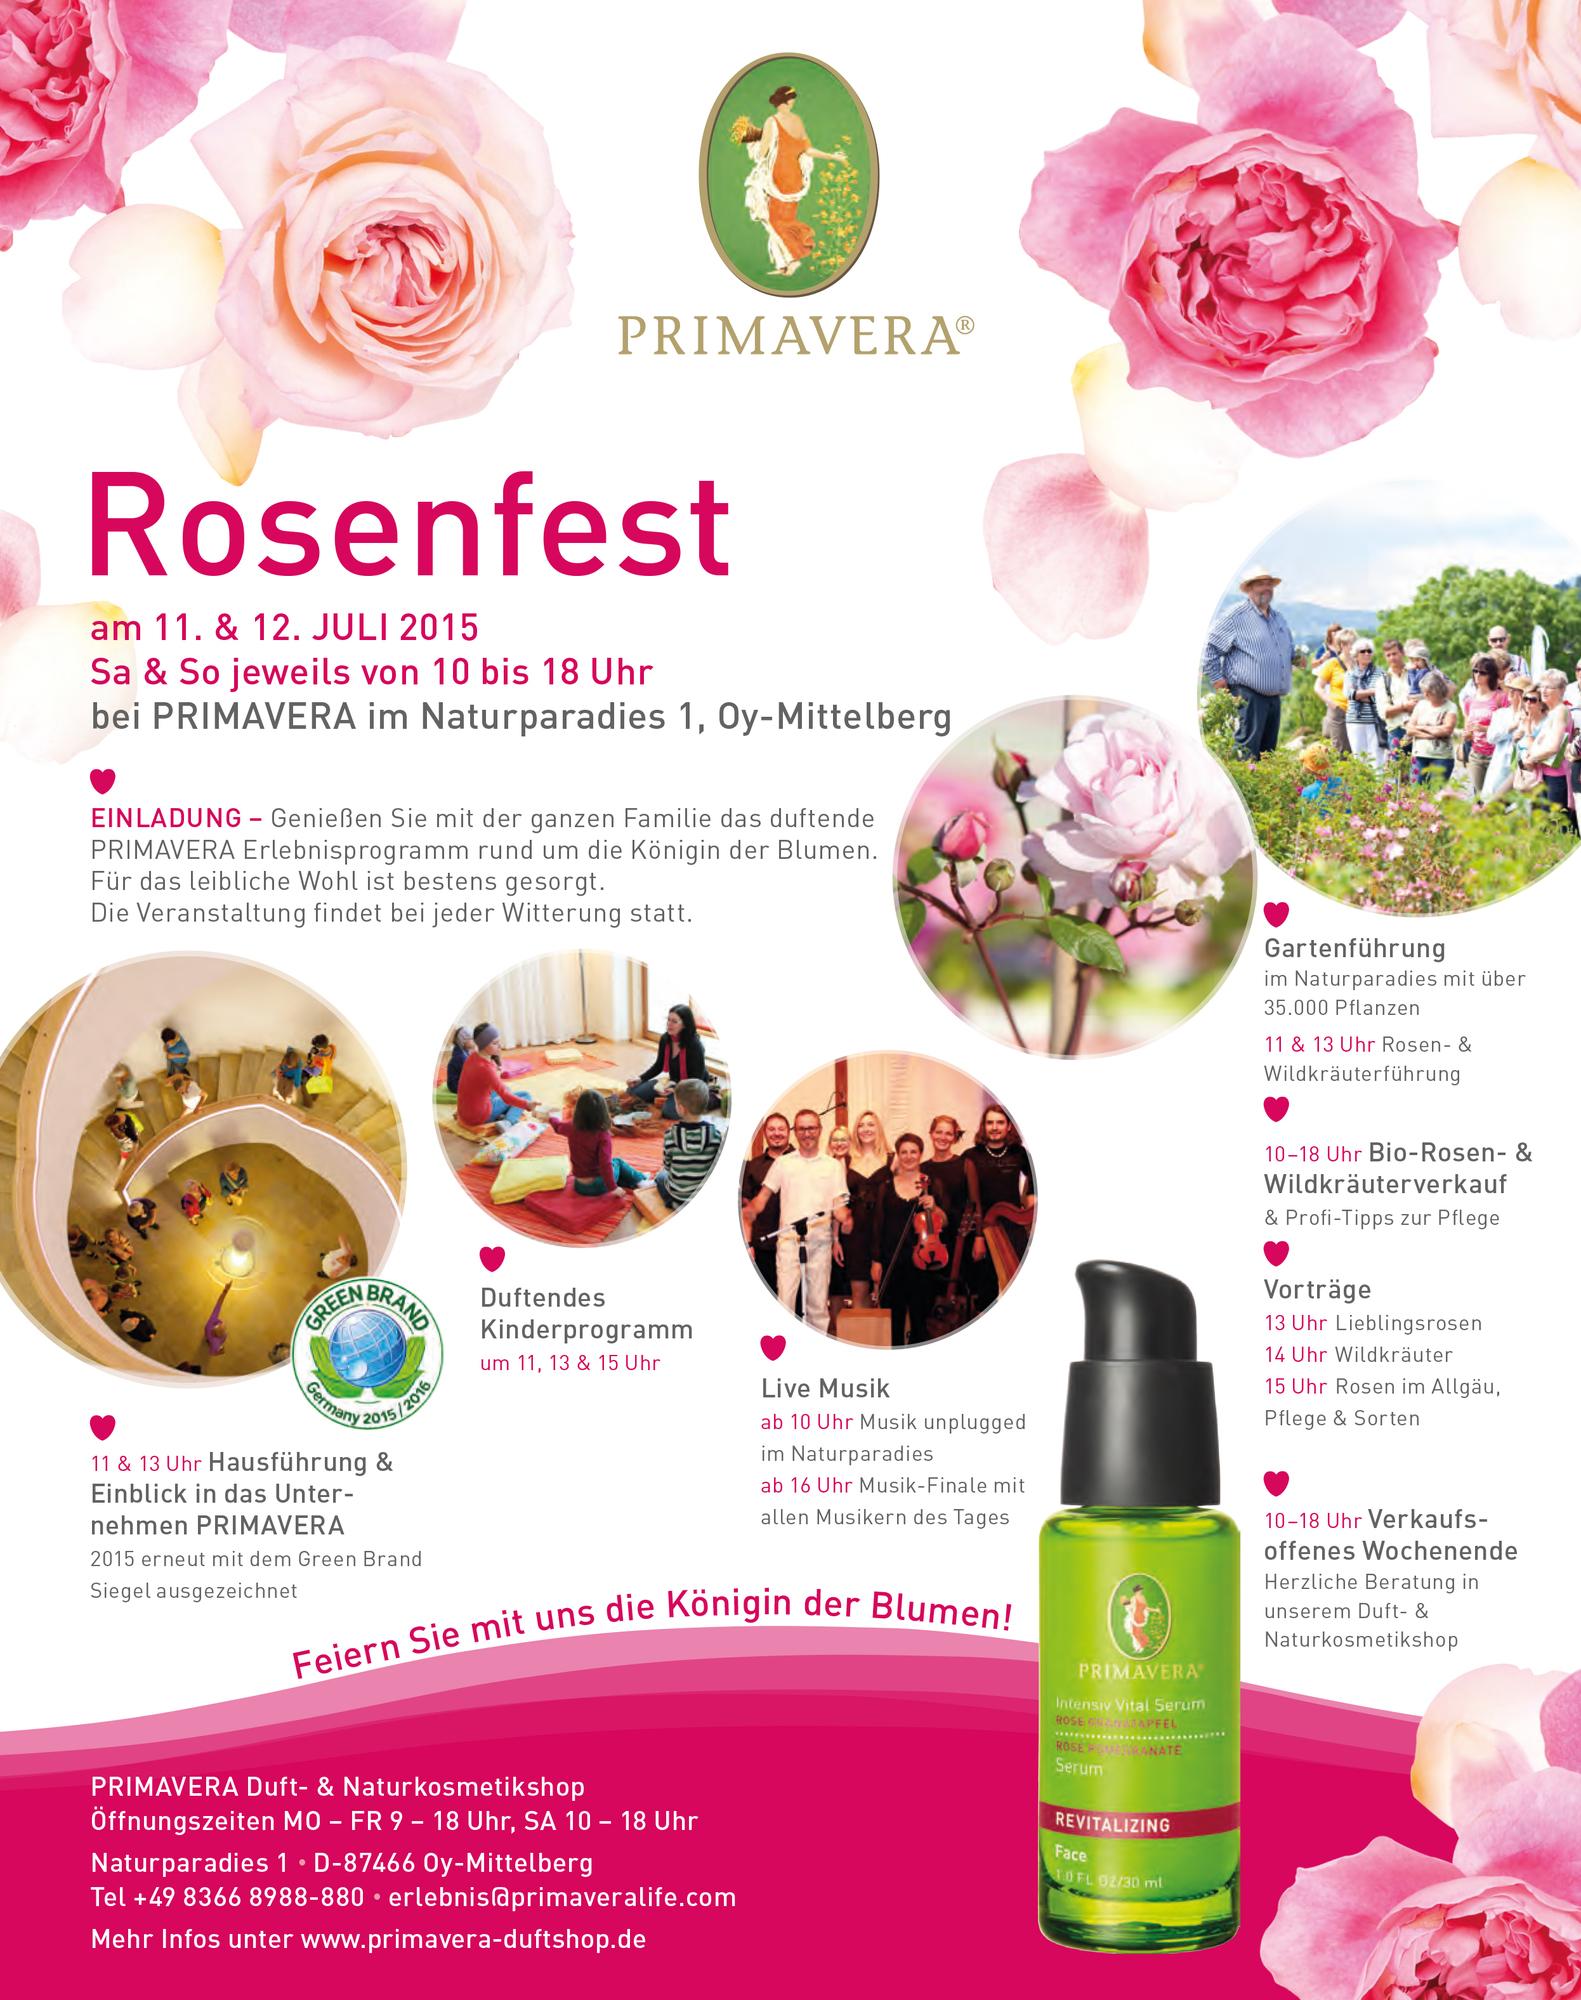 primavera rosenfest in oy mittelberg kempten gastfreund. Black Bedroom Furniture Sets. Home Design Ideas